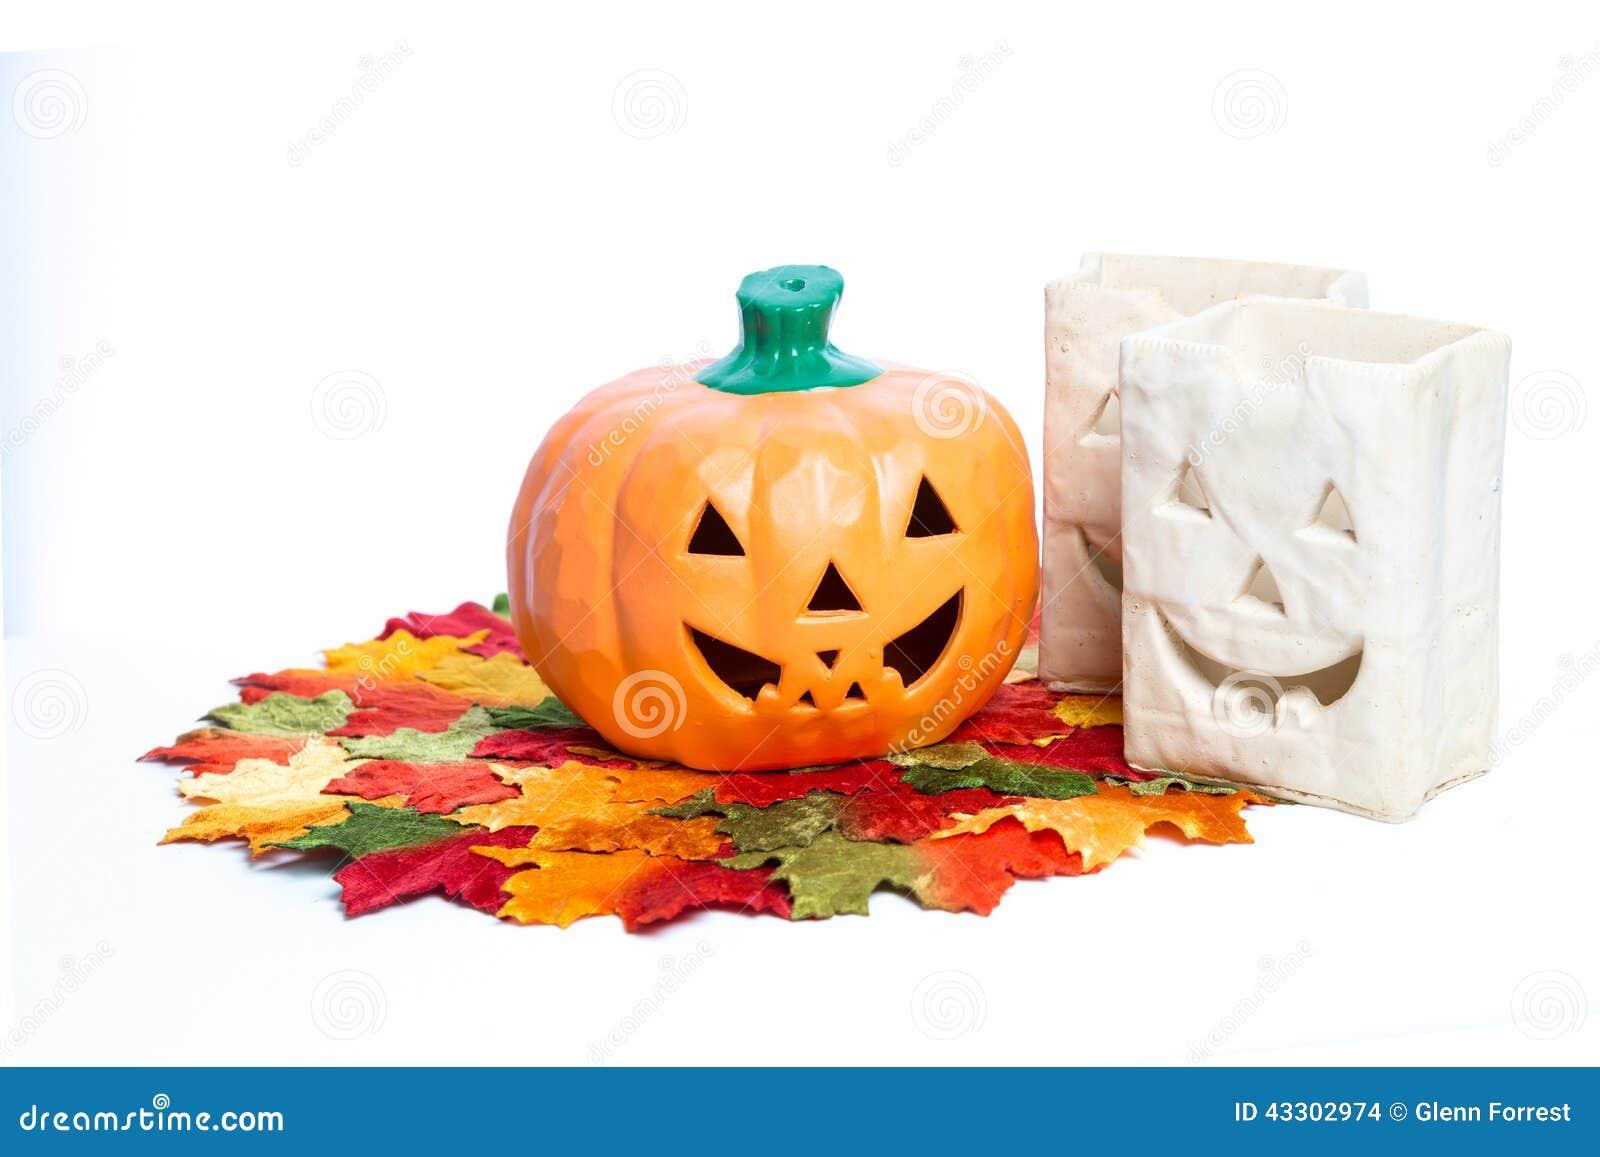 Halloween Pumpkins And Candles Stock Photo Image Of Halloween Christmas 43302974